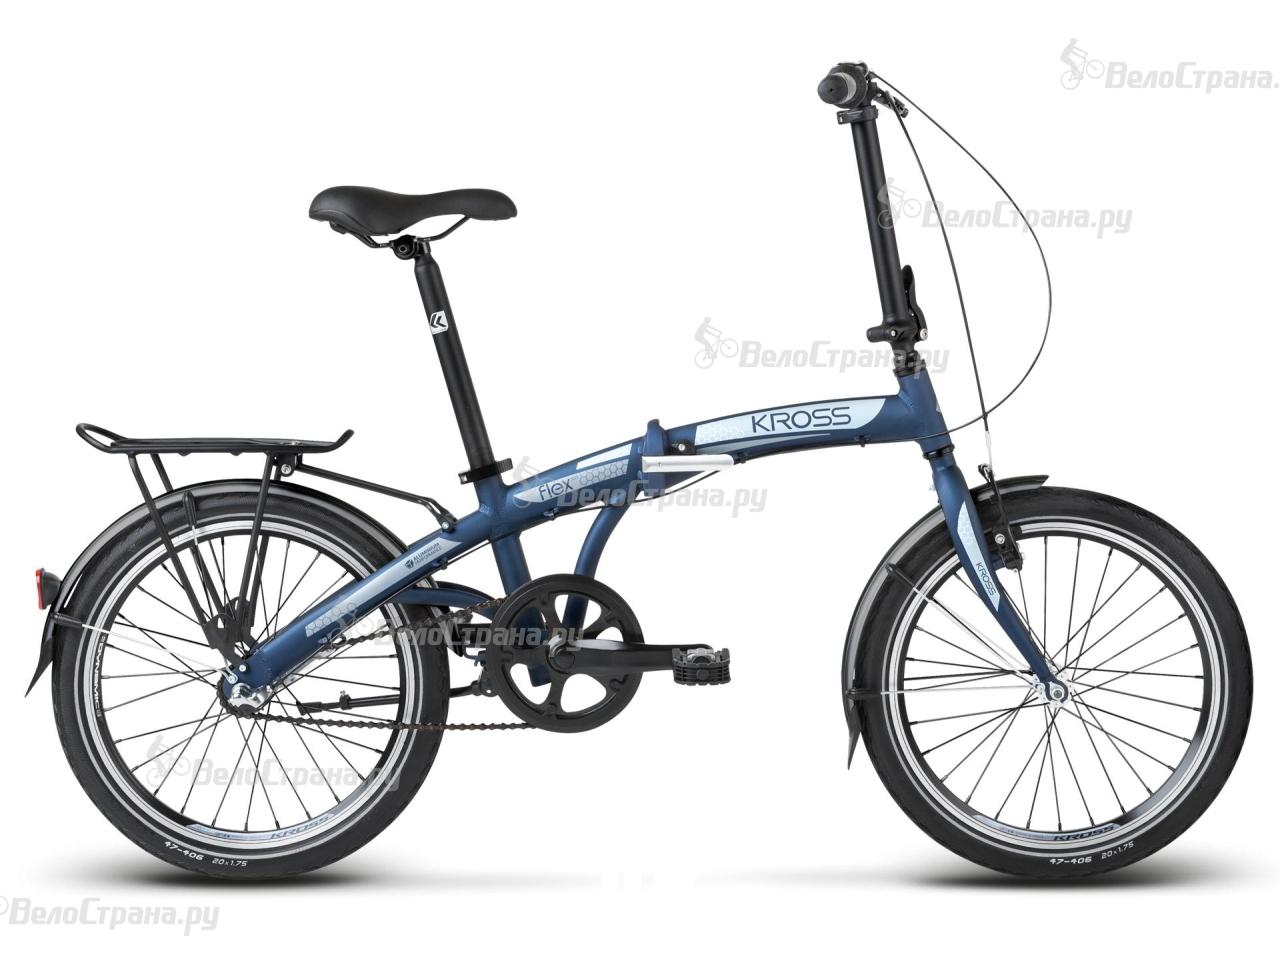 Велосипед Kross Flex 3.0 (2017) велосипед kross flex 2 0 2015